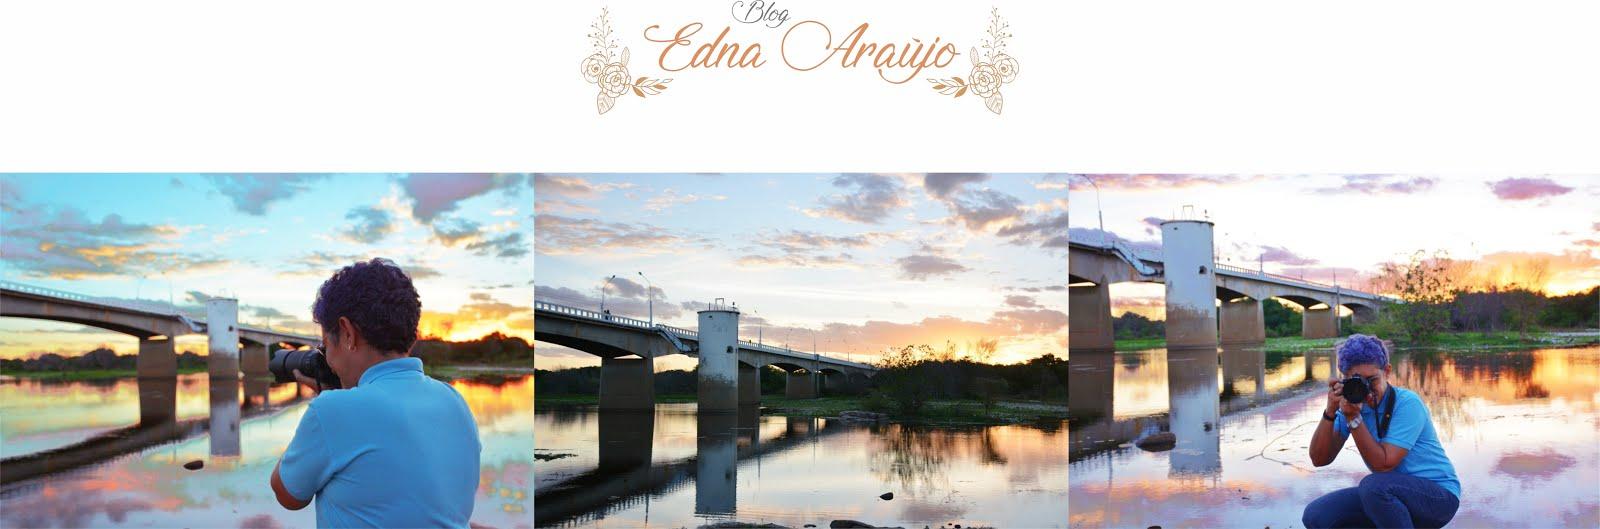 Blog Edna Araújo